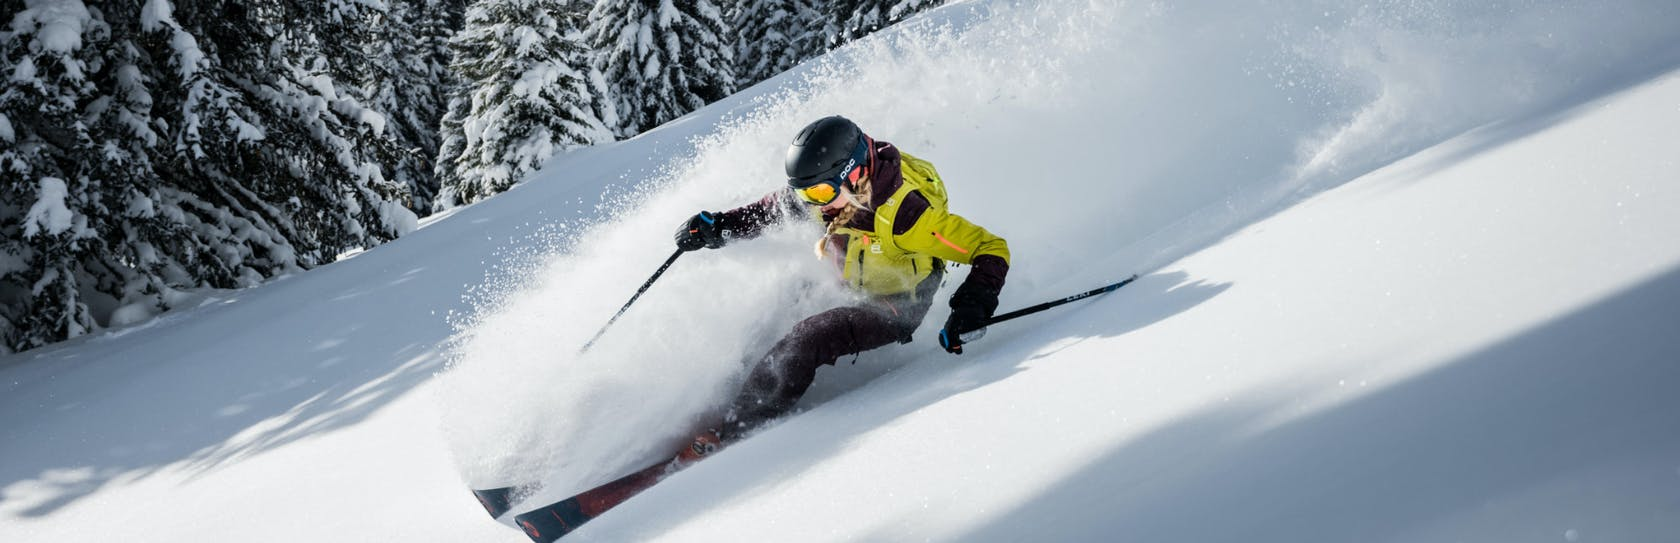 Skitouring Ortovox SPORTLER shop online